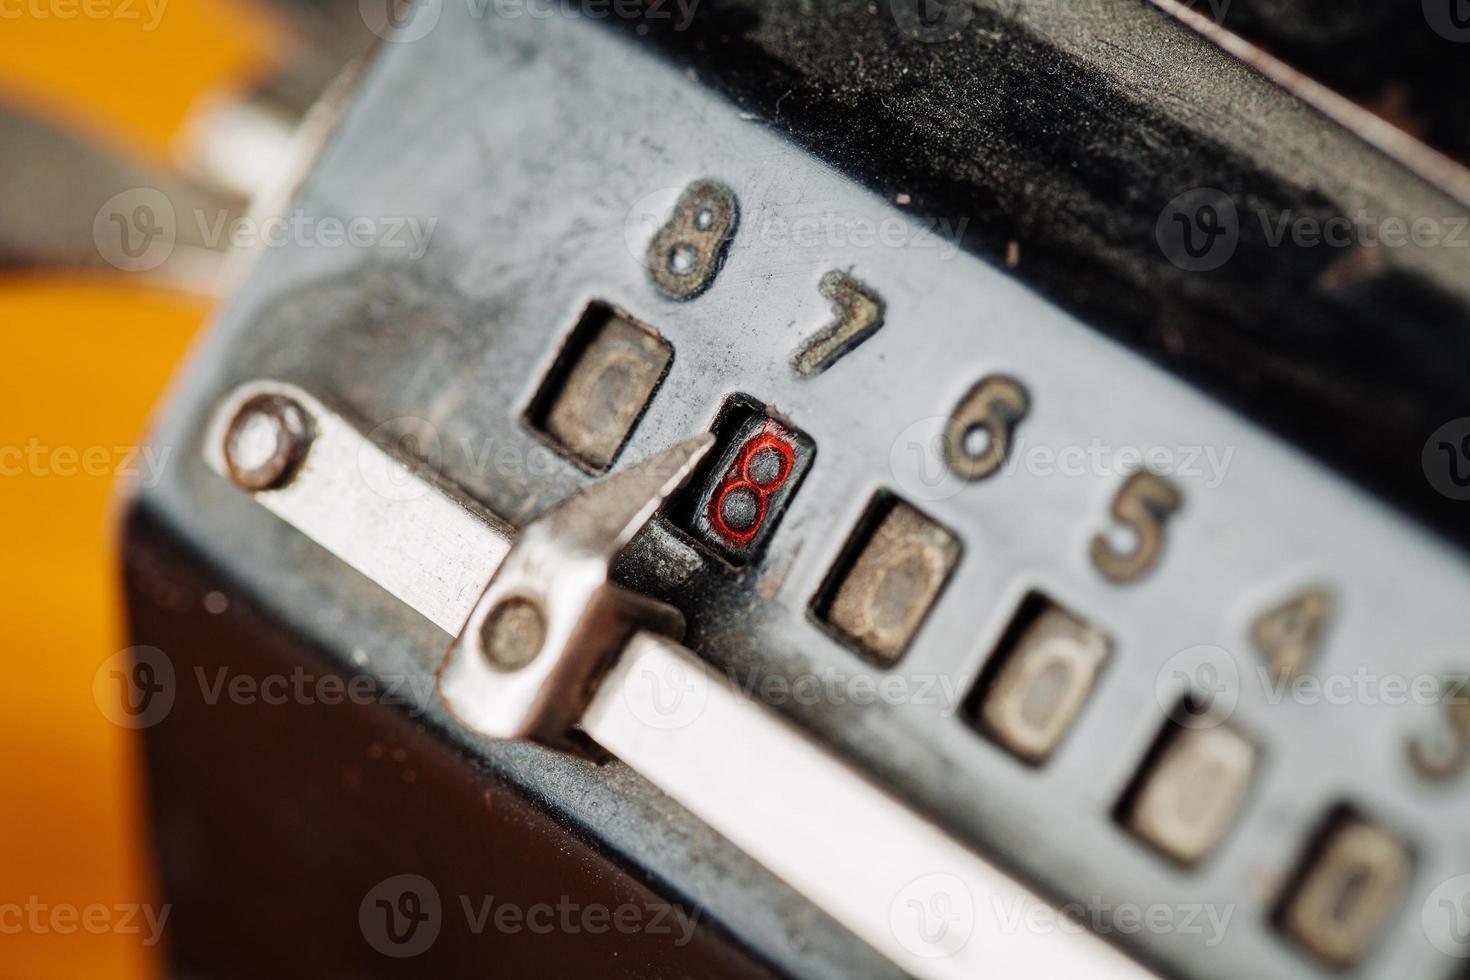 Máquina de conteo manual mecánica vintage para cálculo matemático foto